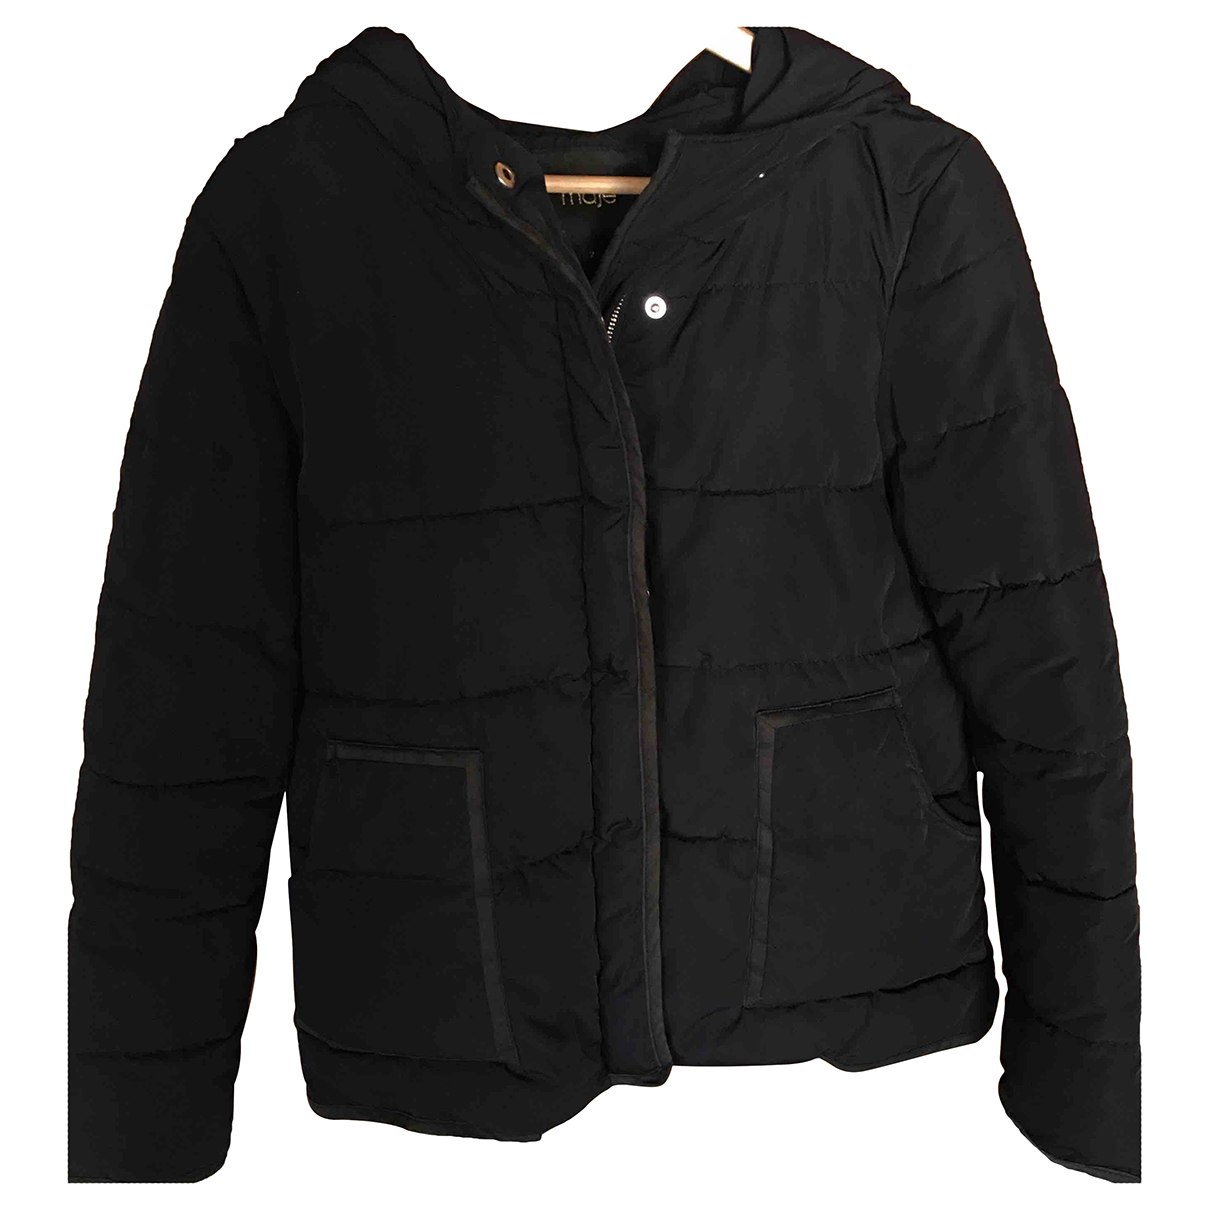 Maje - Manteau   pour femme - marine